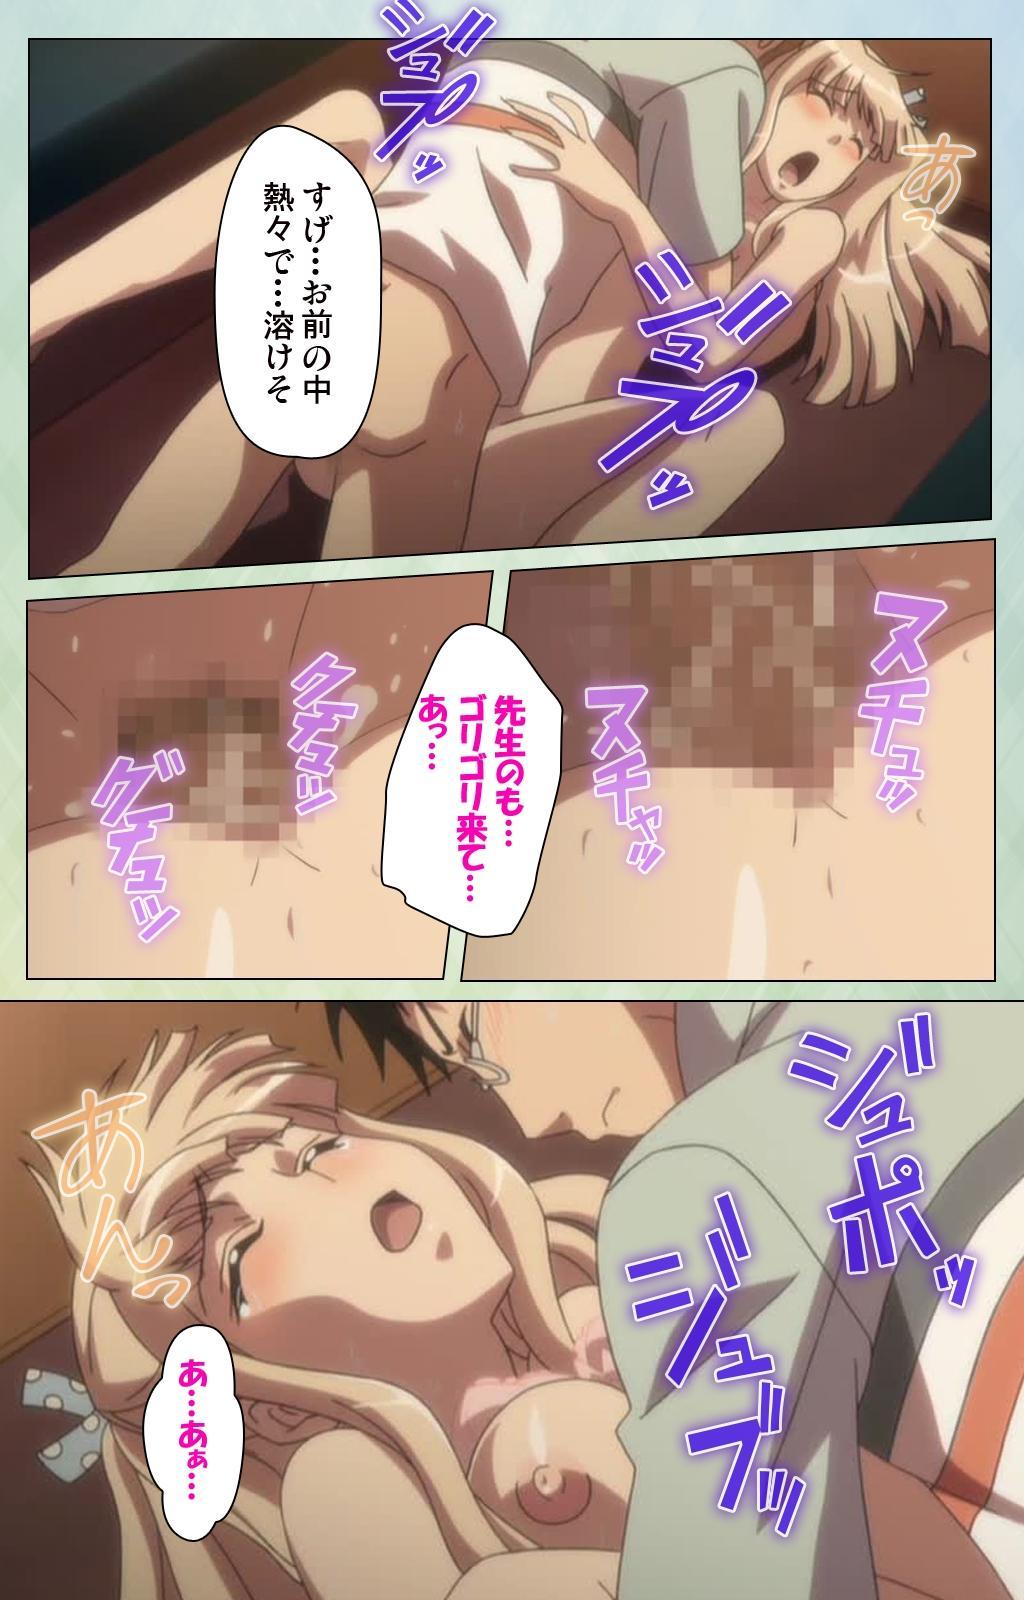 Furueru Kuchibiru fuzzy lips1 Complete Ban 69